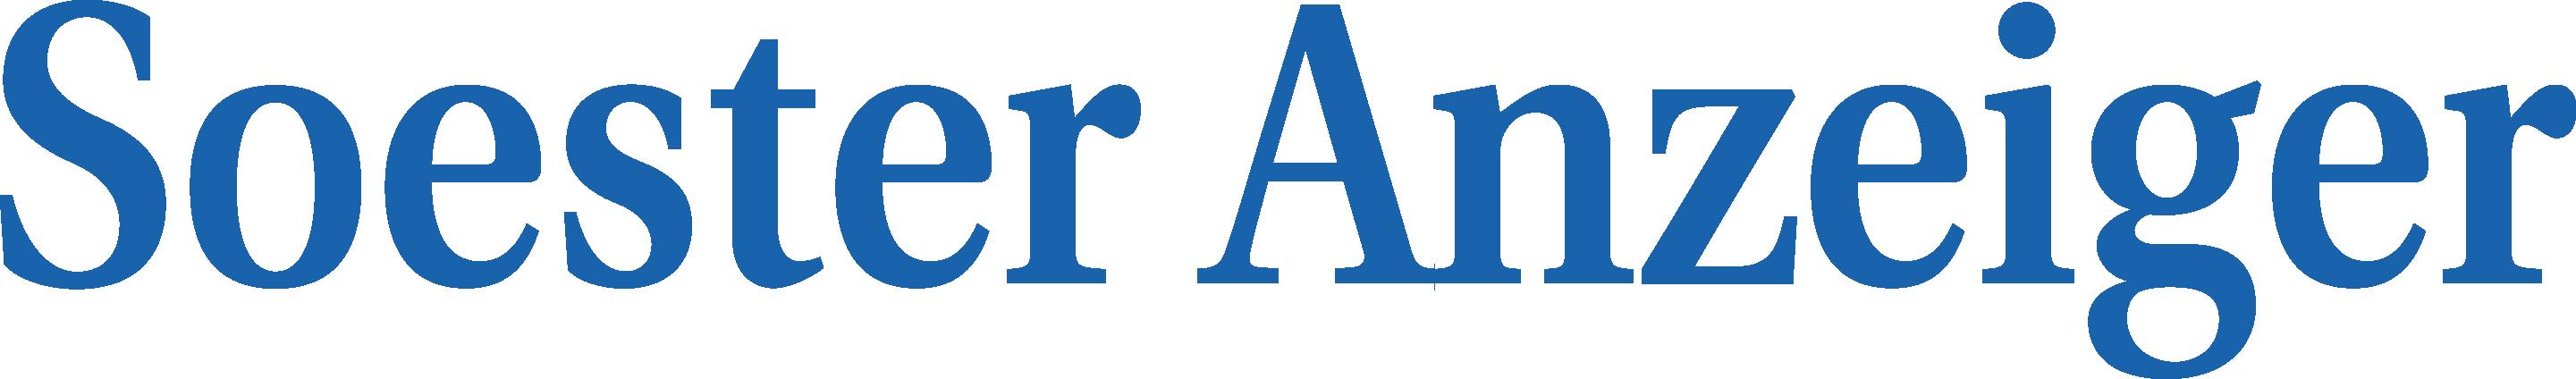 Soester Anzeiger Logo